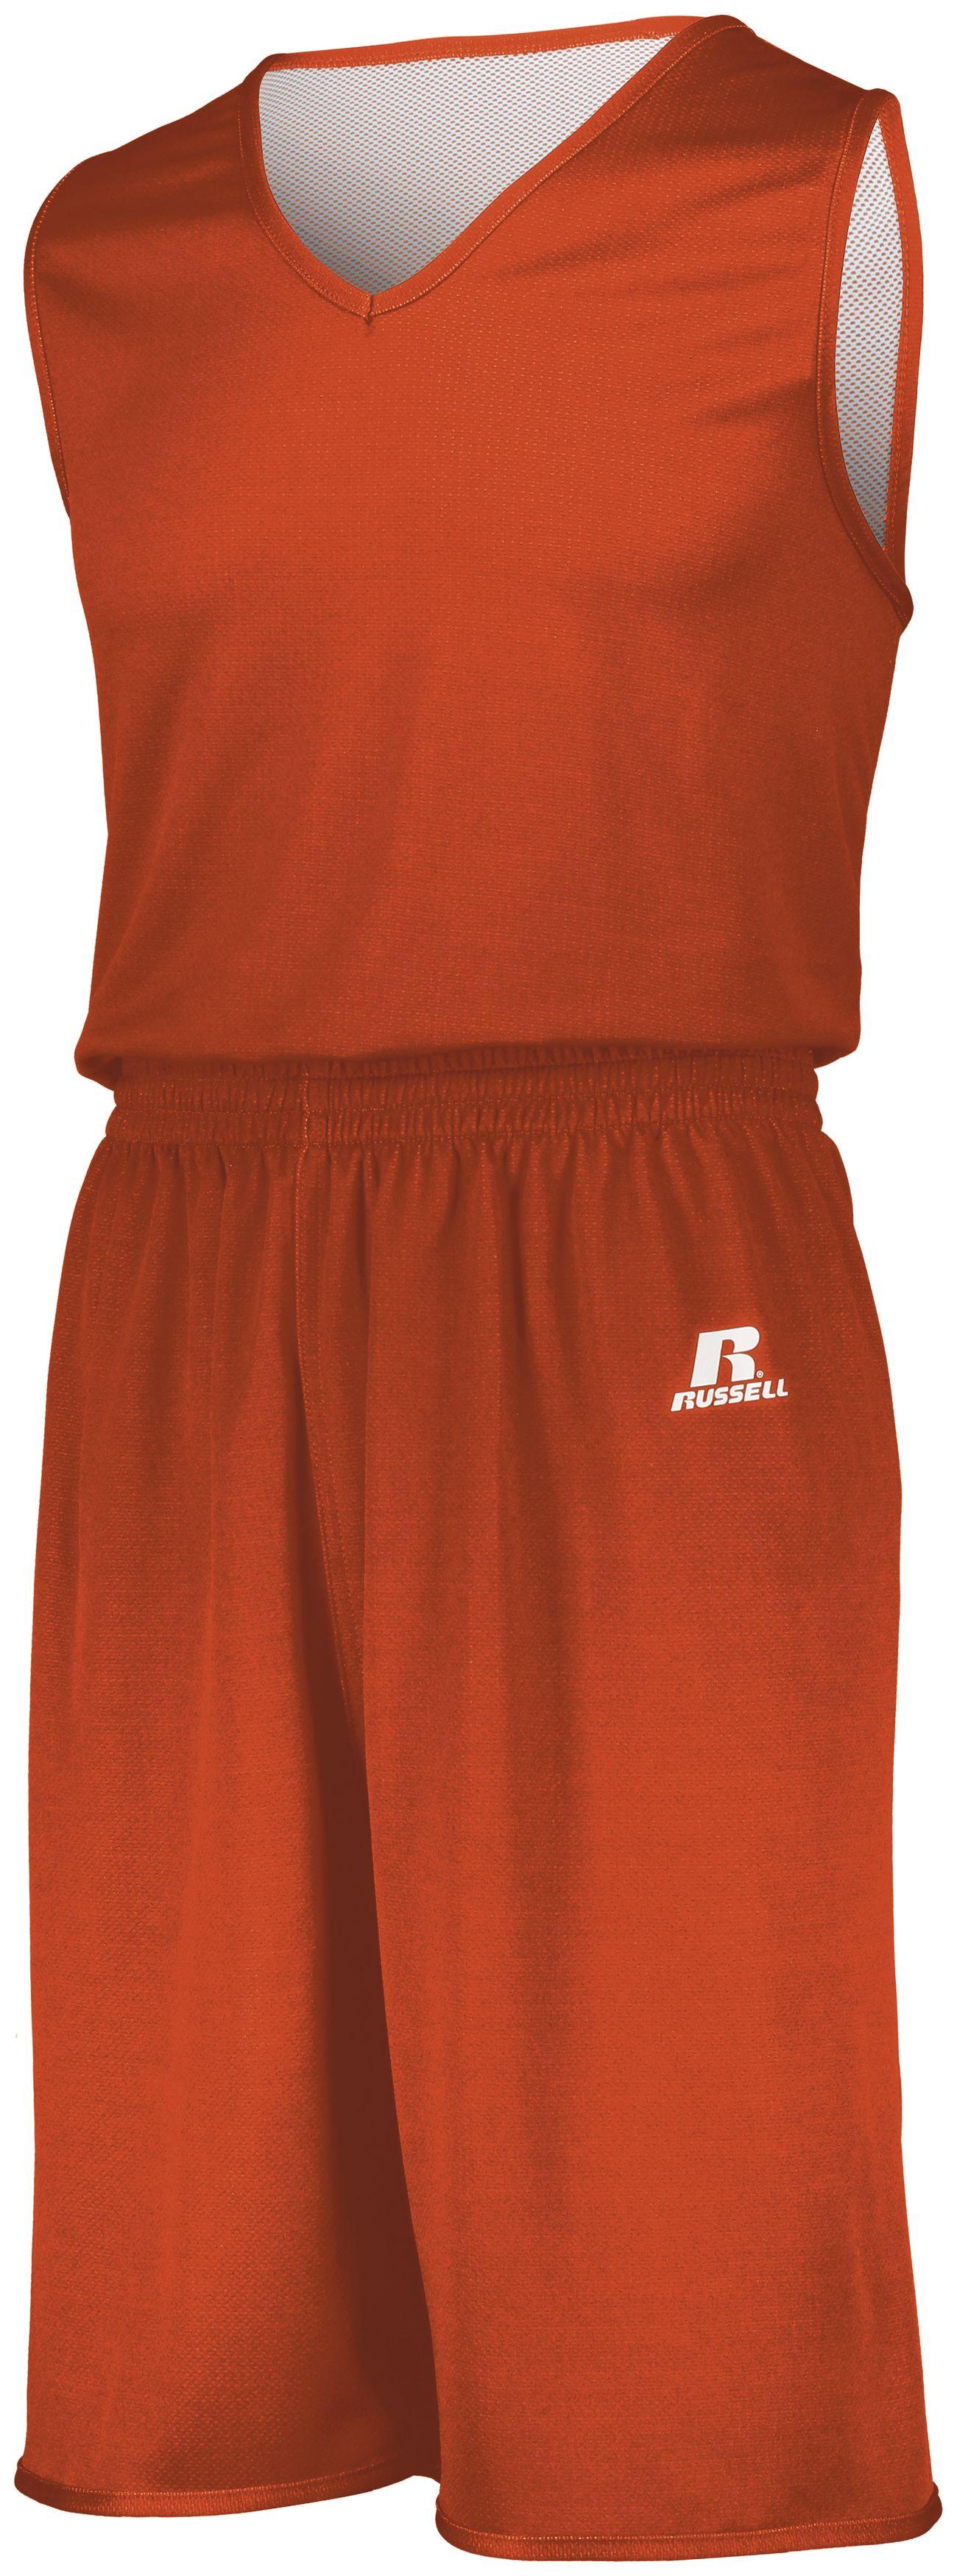 Youth Undivided Solid Single Ply Reversible Shorts - BURNT ORANGE/WHITE